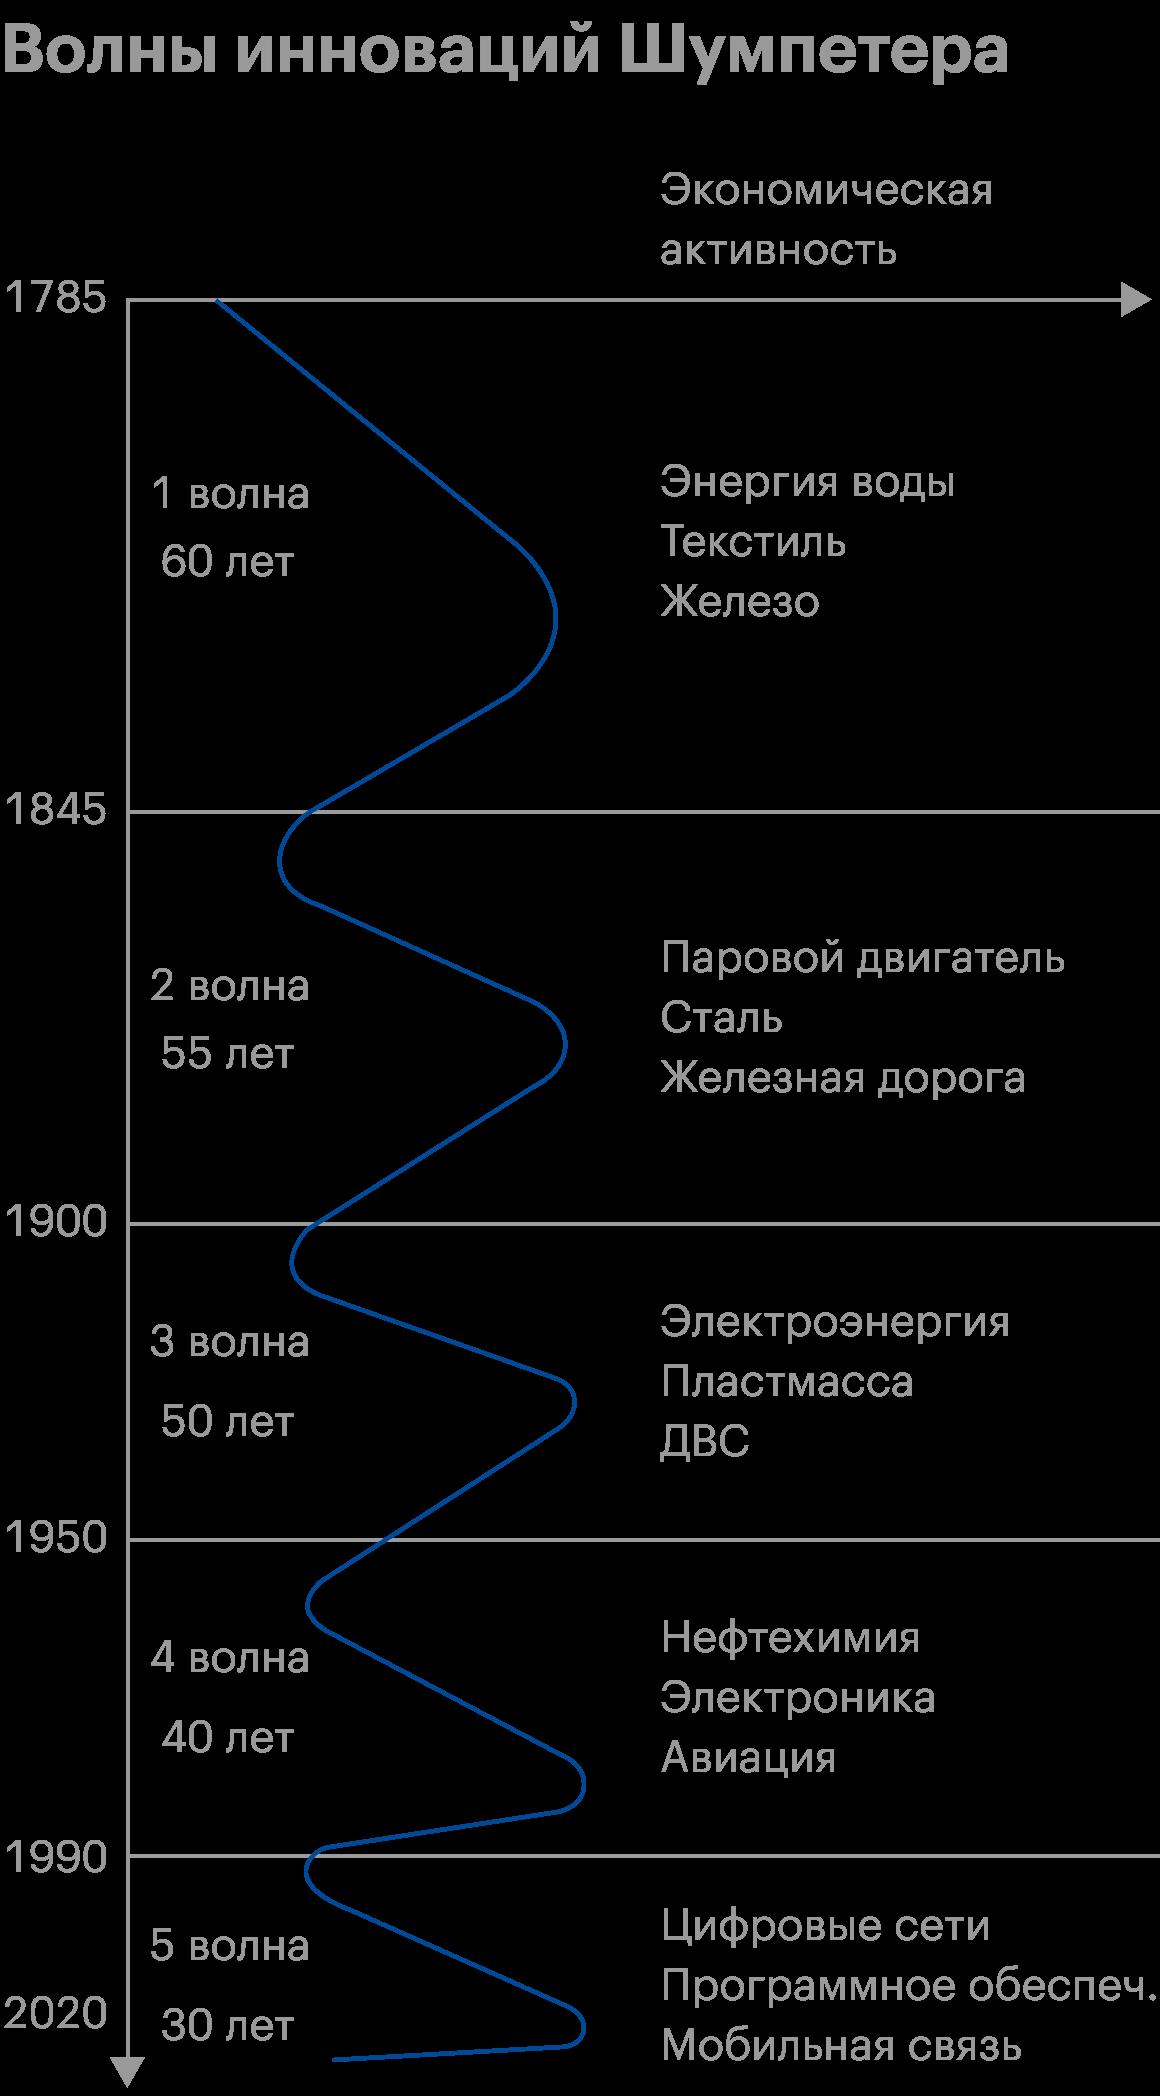 Источник: Digitalization andsociety's sustainable development – Measures andimplications, Milica Jovanović